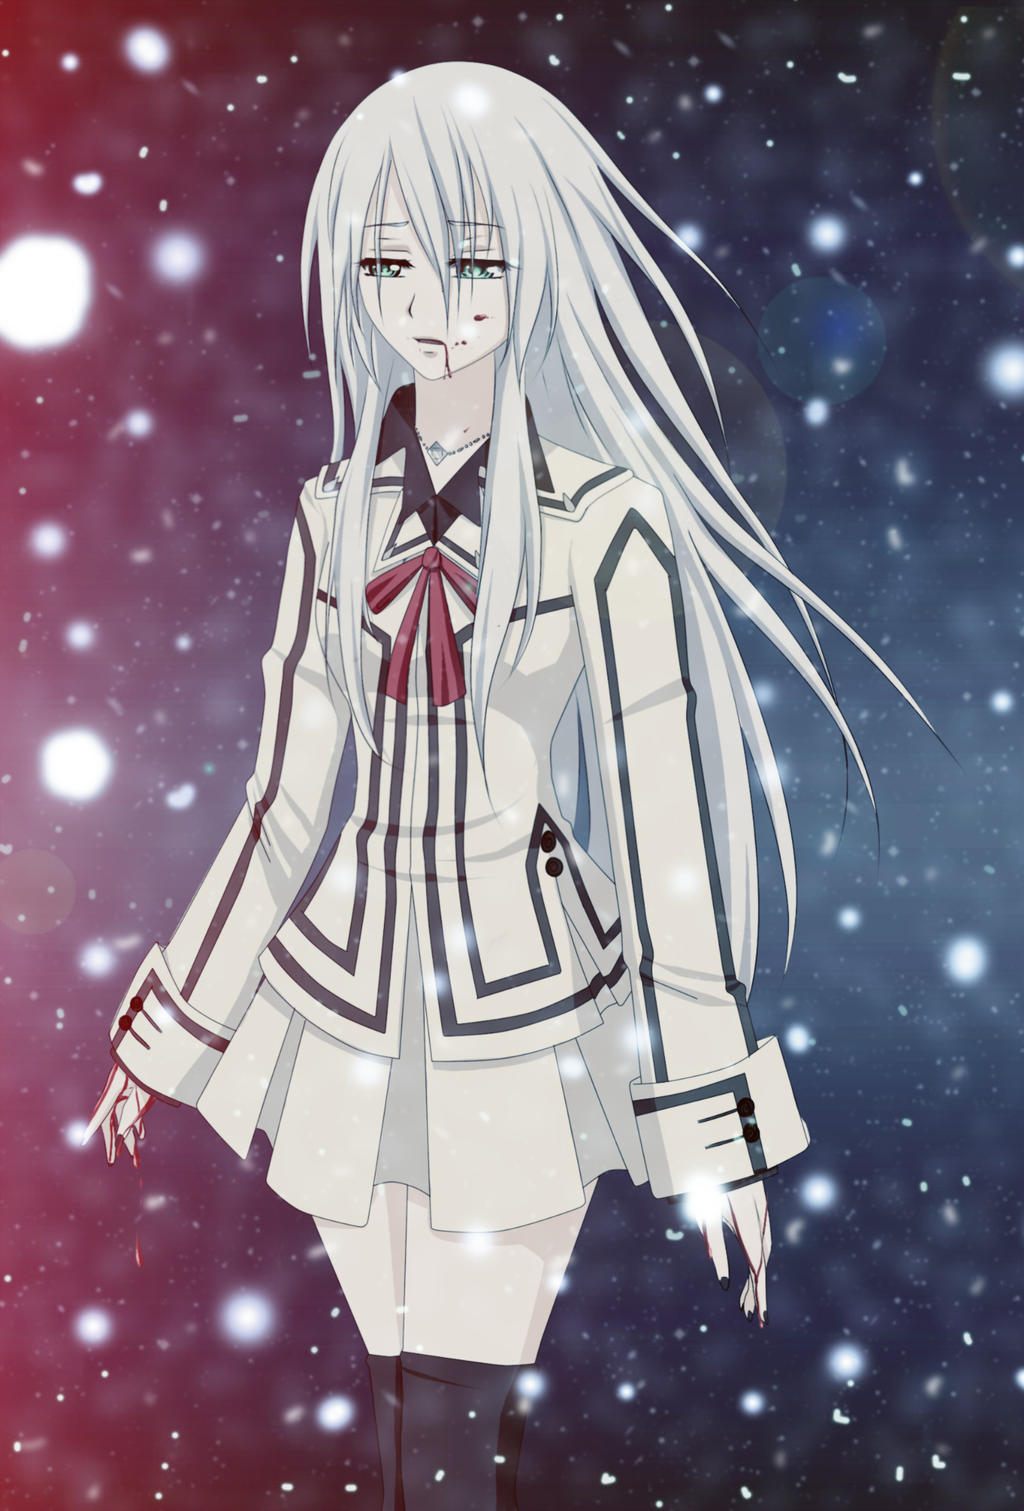 Anime Characters Vampire Knight : Vampire knight oc by whiterabbit on deviantart